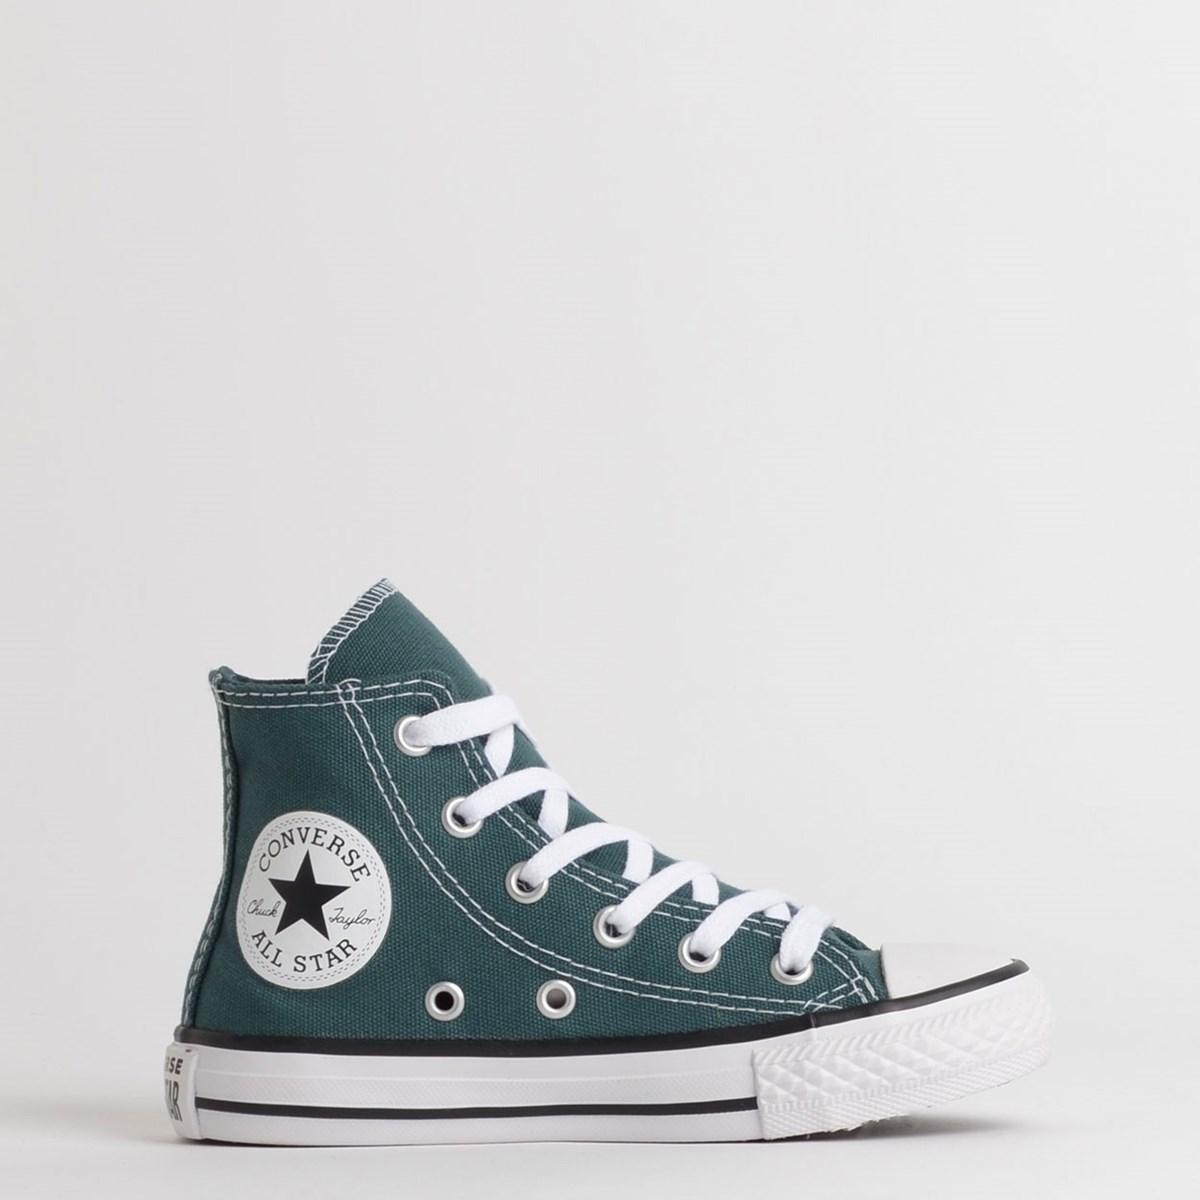 Tênis Converse Chuck Taylor All Star Kids Hi Verde Escuro Preto CK08310001